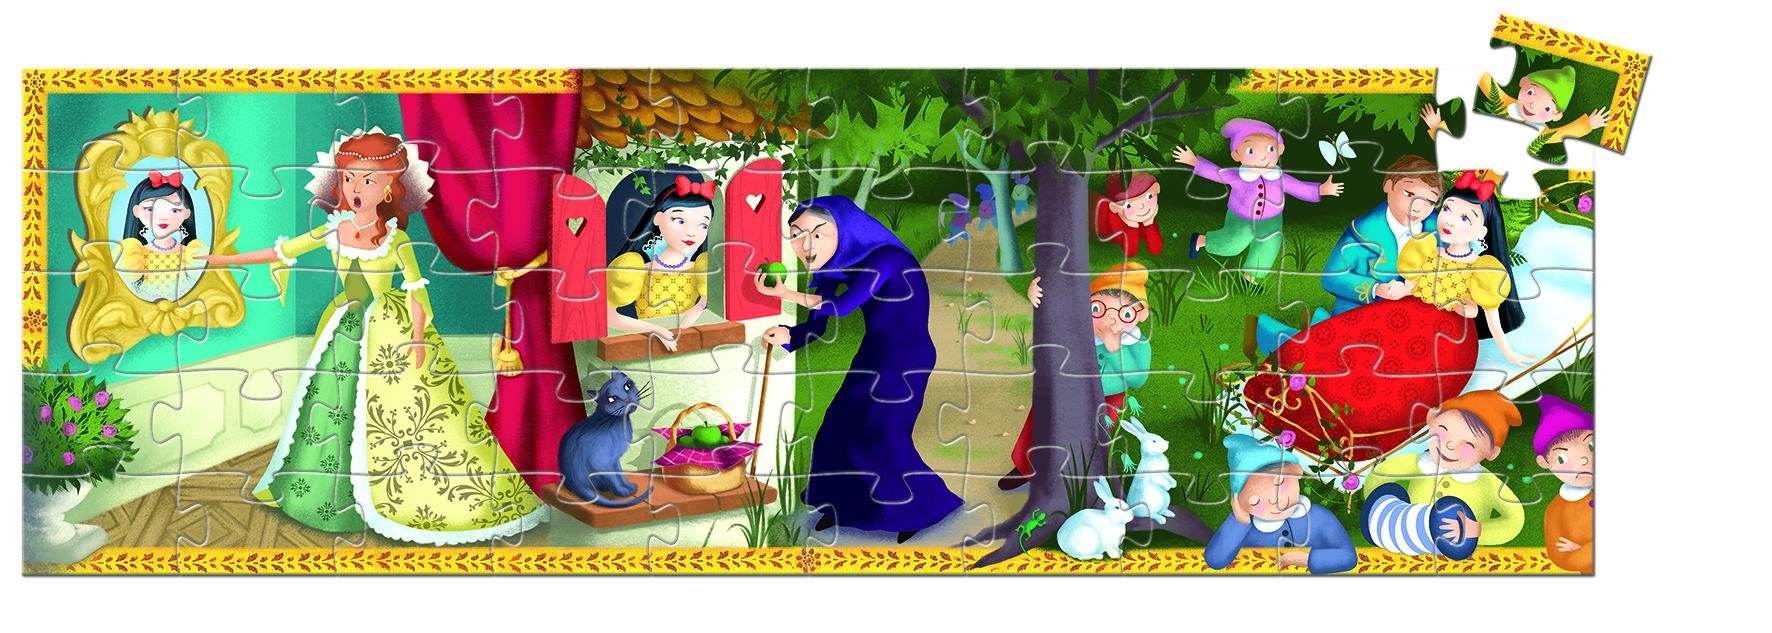 Djeco 7259 Silhouette Puzzle Schneewitchen